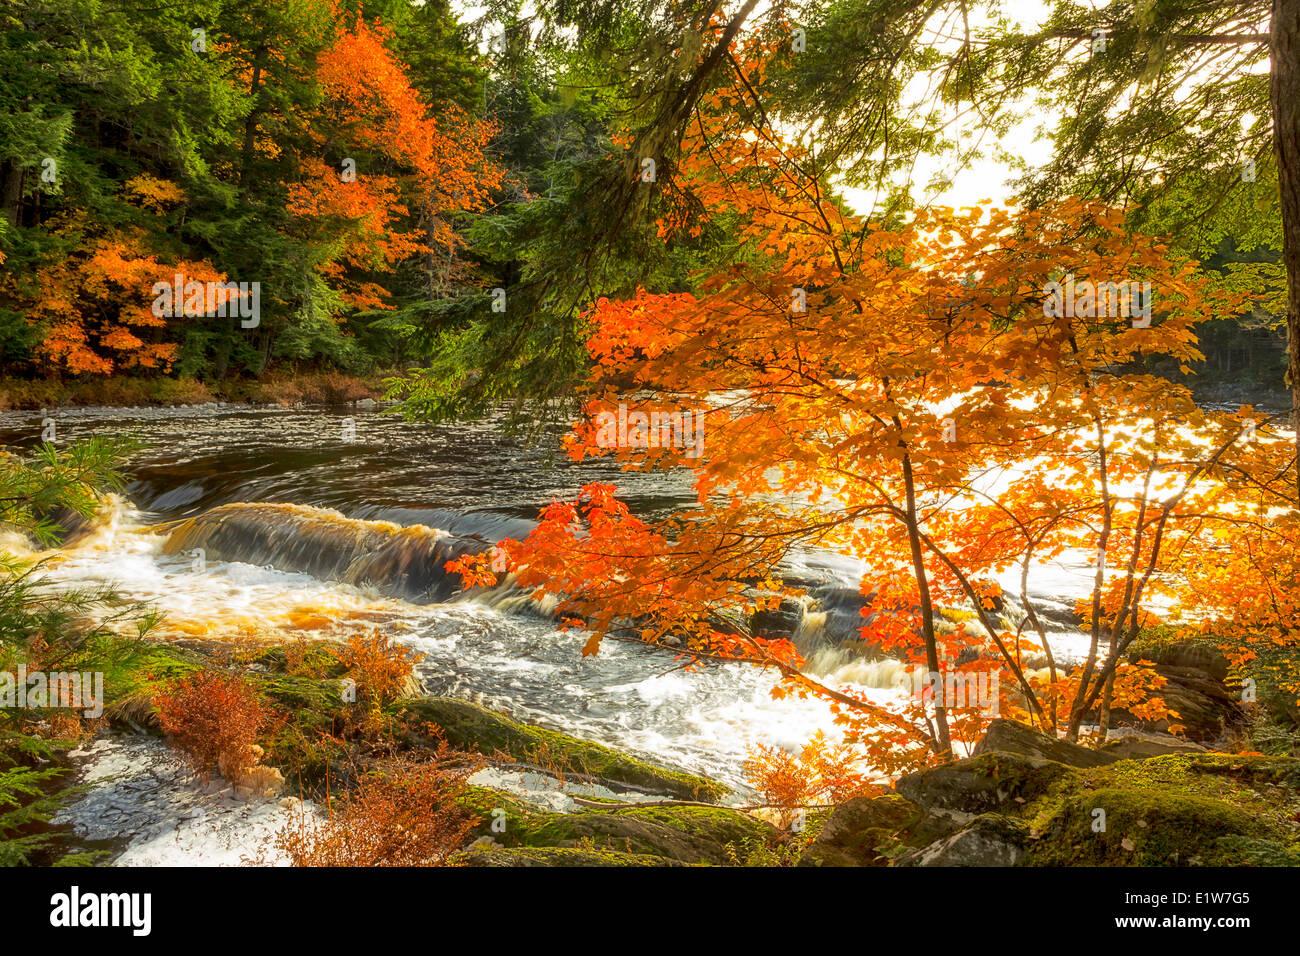 Mills Falls, Mersey River, Kejimkujik National Park, Nova Scotia, Canada - Stock Image